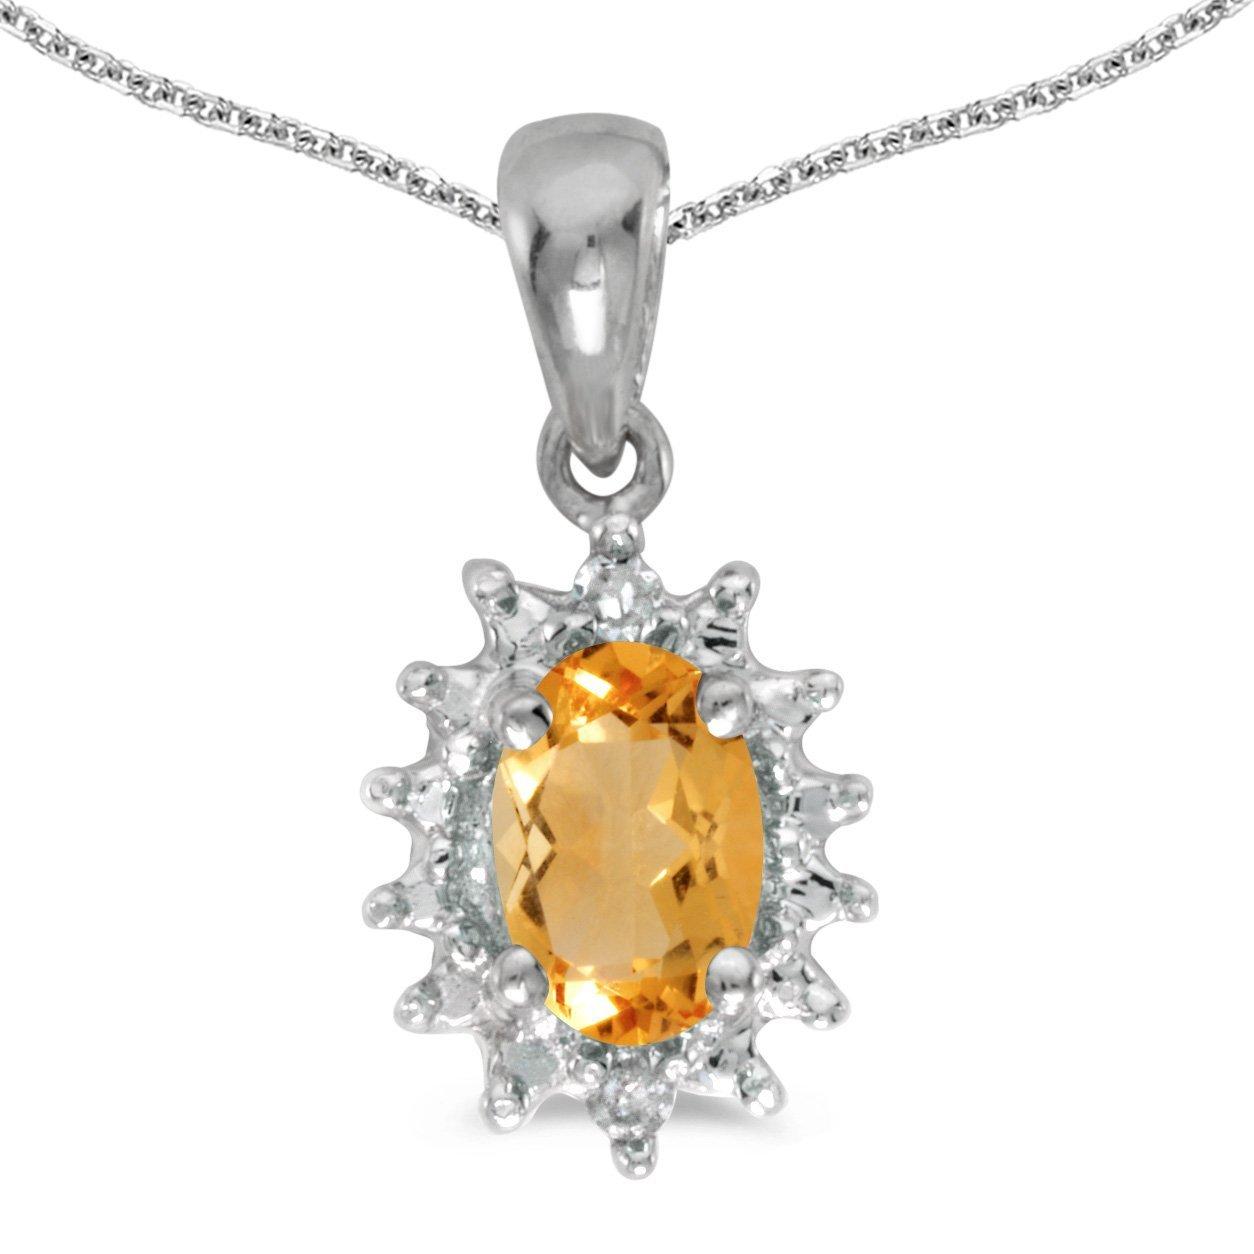 0.47 Cttw. FB Jewels Solid 14k White Gold Genuine Birthstone Oval Gemstone And Diamond Pendant